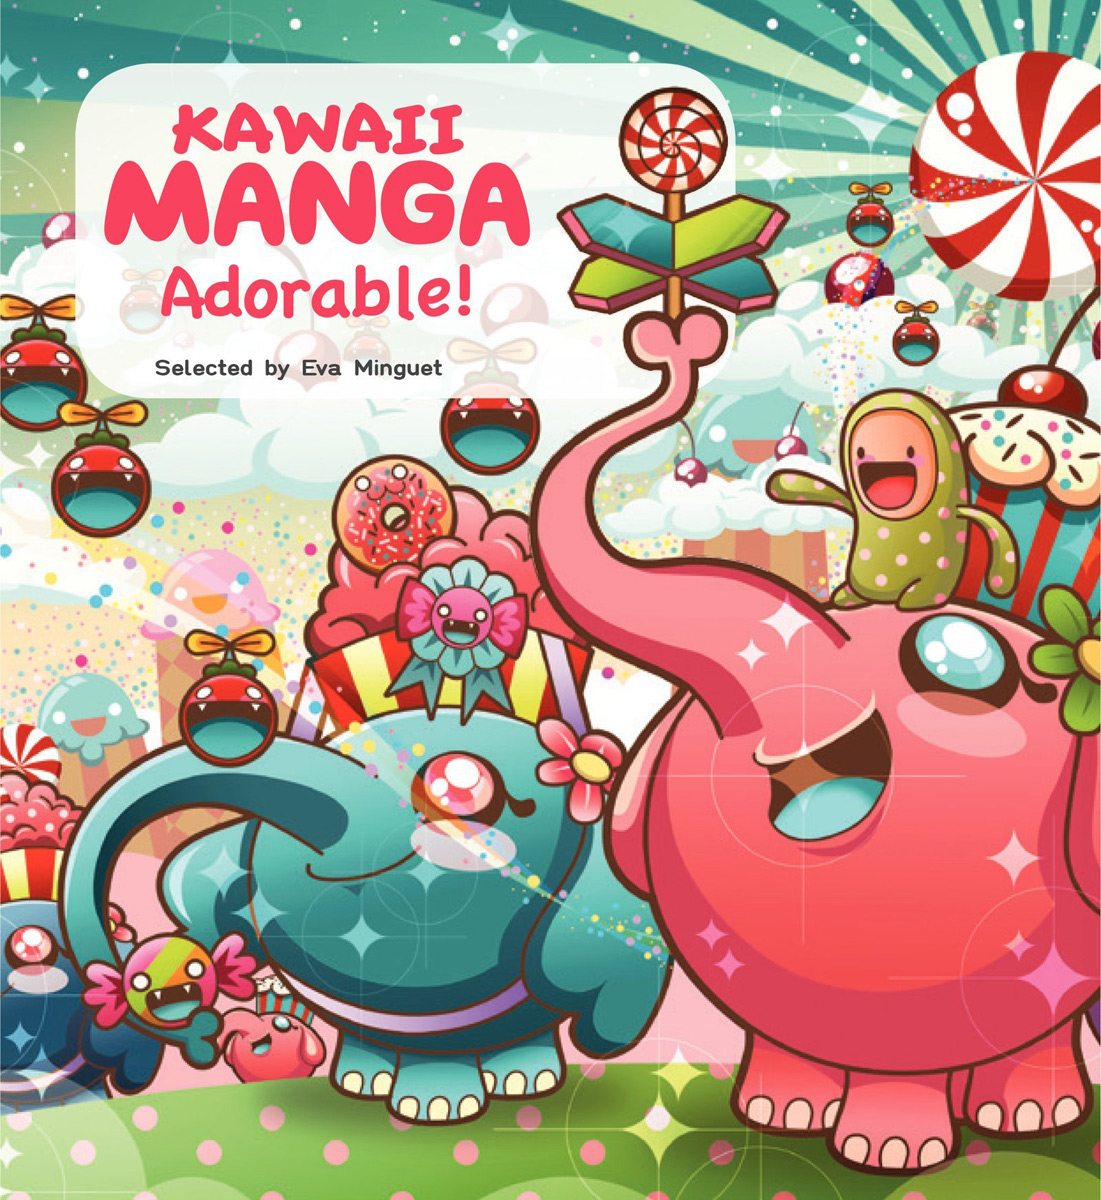 Kawaii Manga: Adorable! kawaii manga adorable